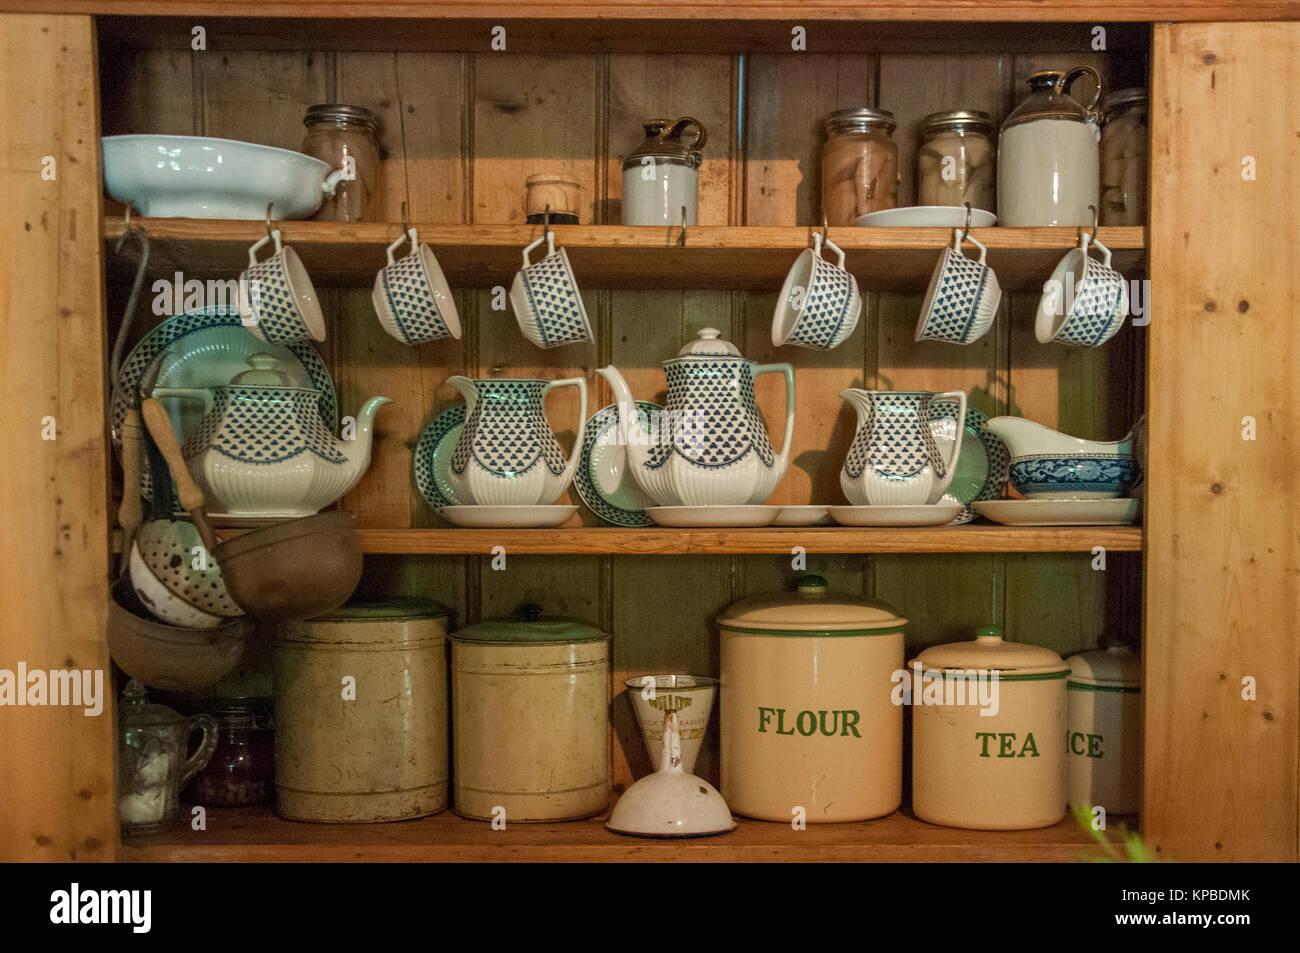 Rustic kitchenware at Lavandula Swiss Italian Farm, near Hepburn Springs, a popular weekend destination in Victoria, Stock Photo